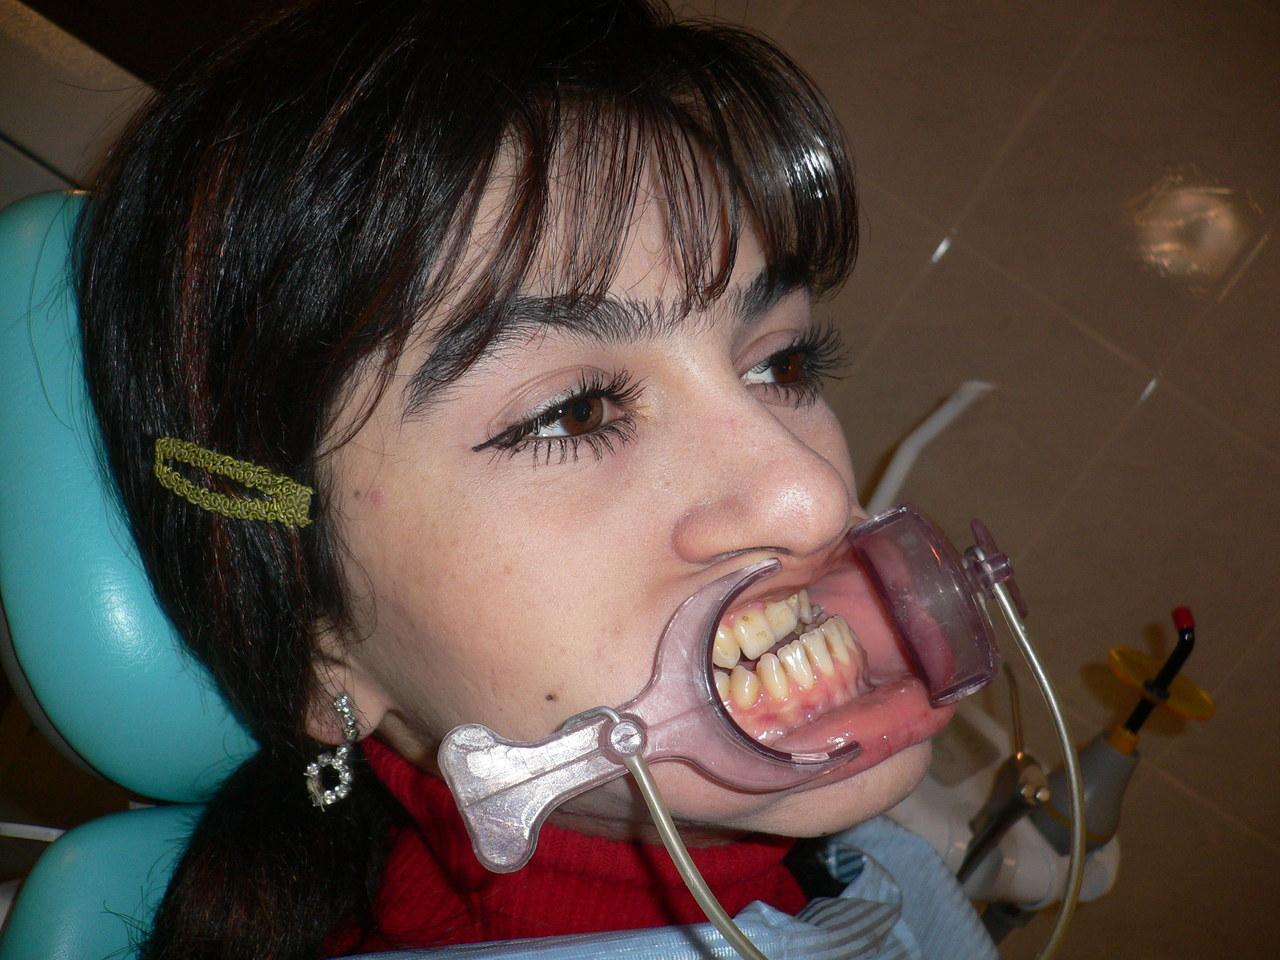 Рис. 2. Внешний вид пациентки с микрогнатией верхней челюсти (вид сбоку).